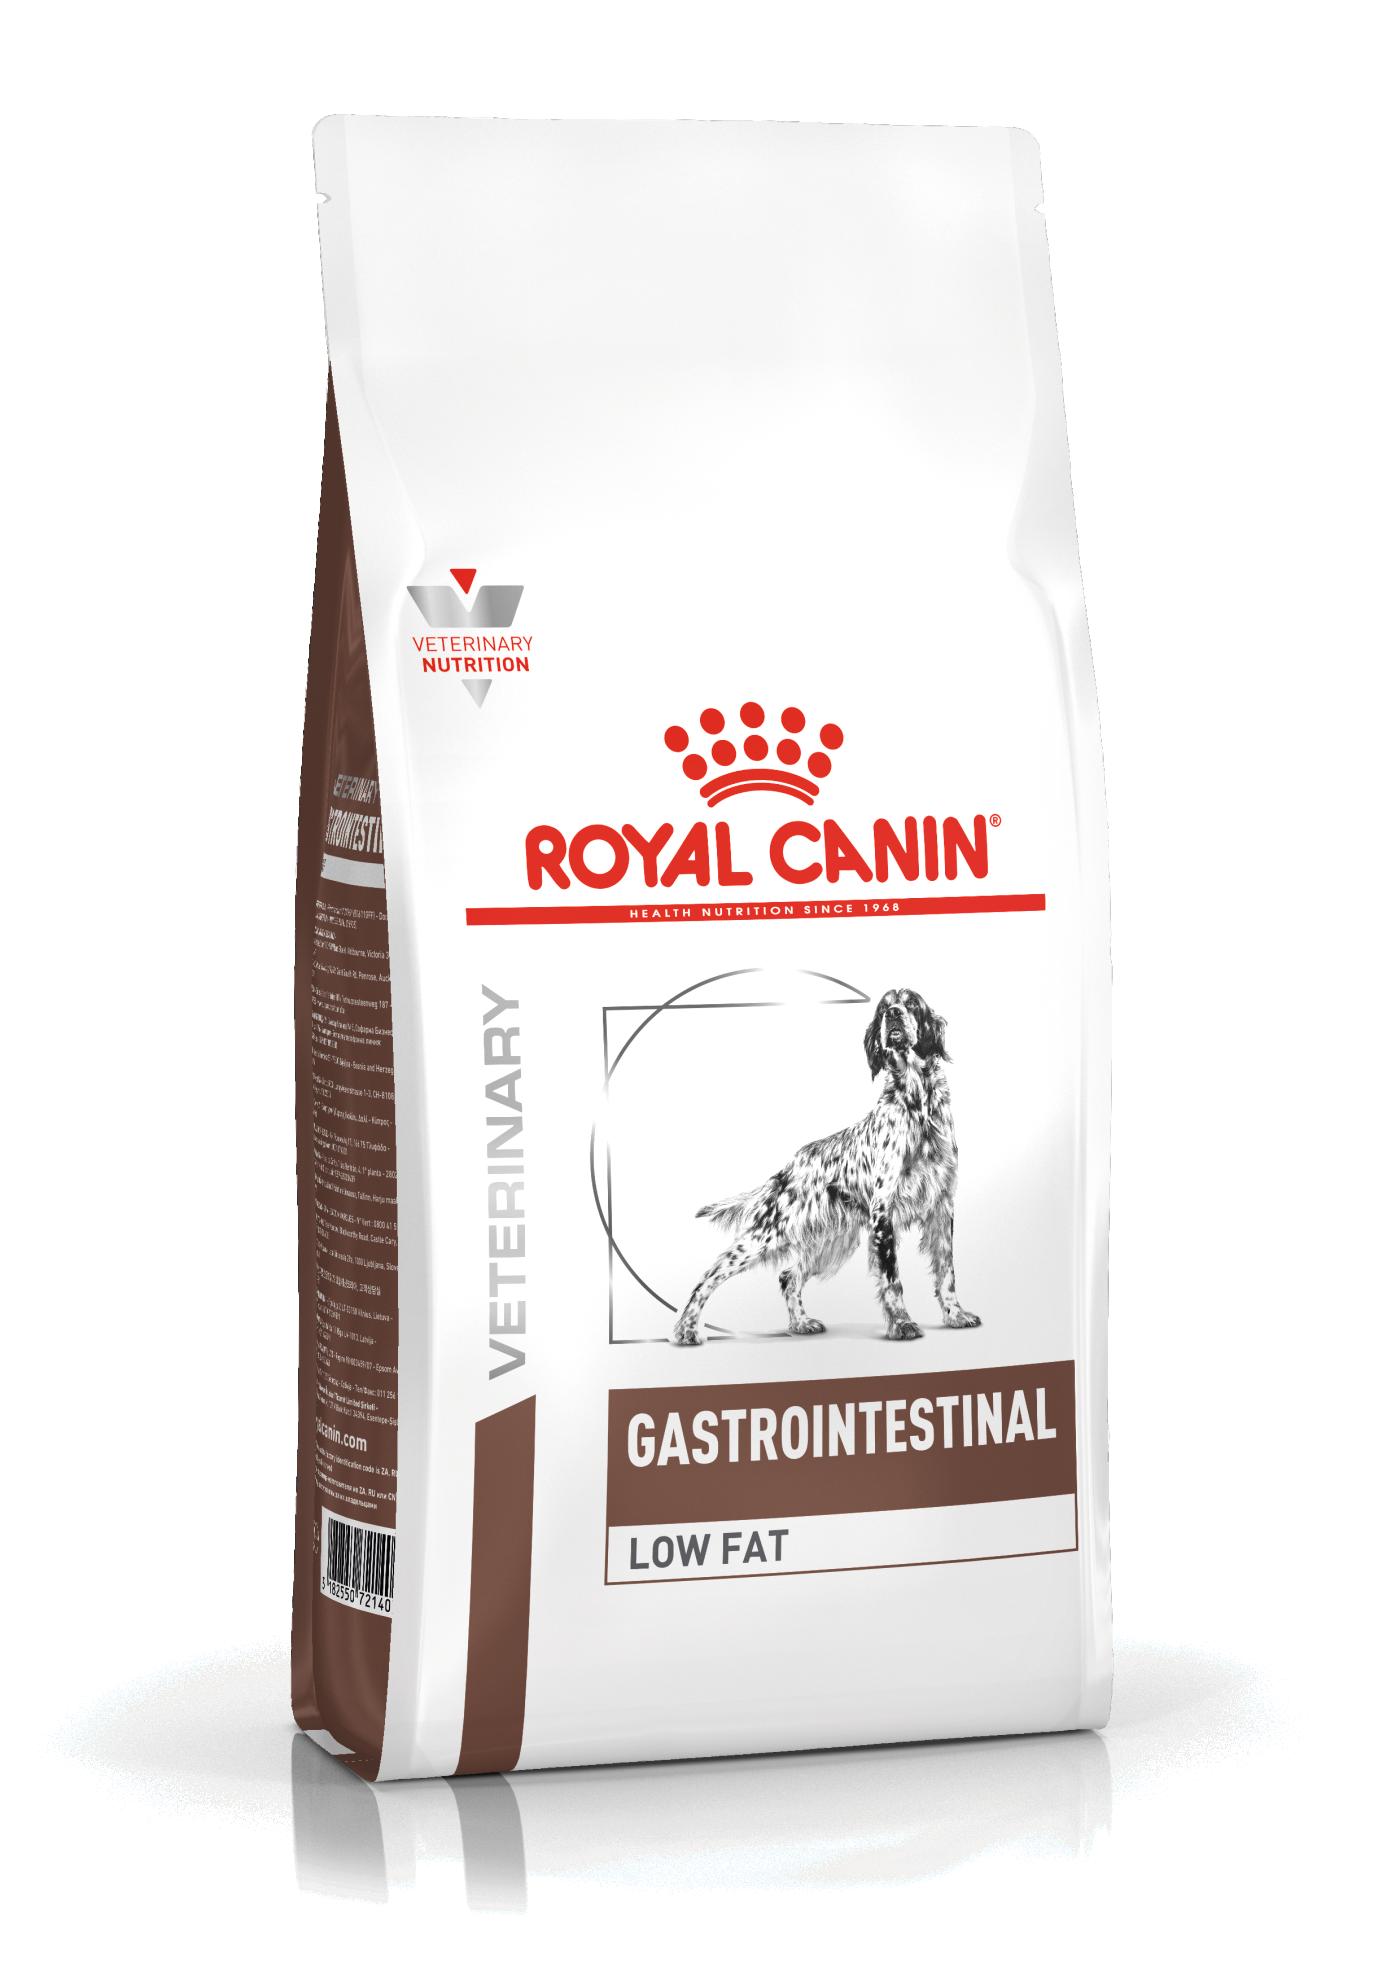 Gastrointestinal Low Fat, 1,5kg